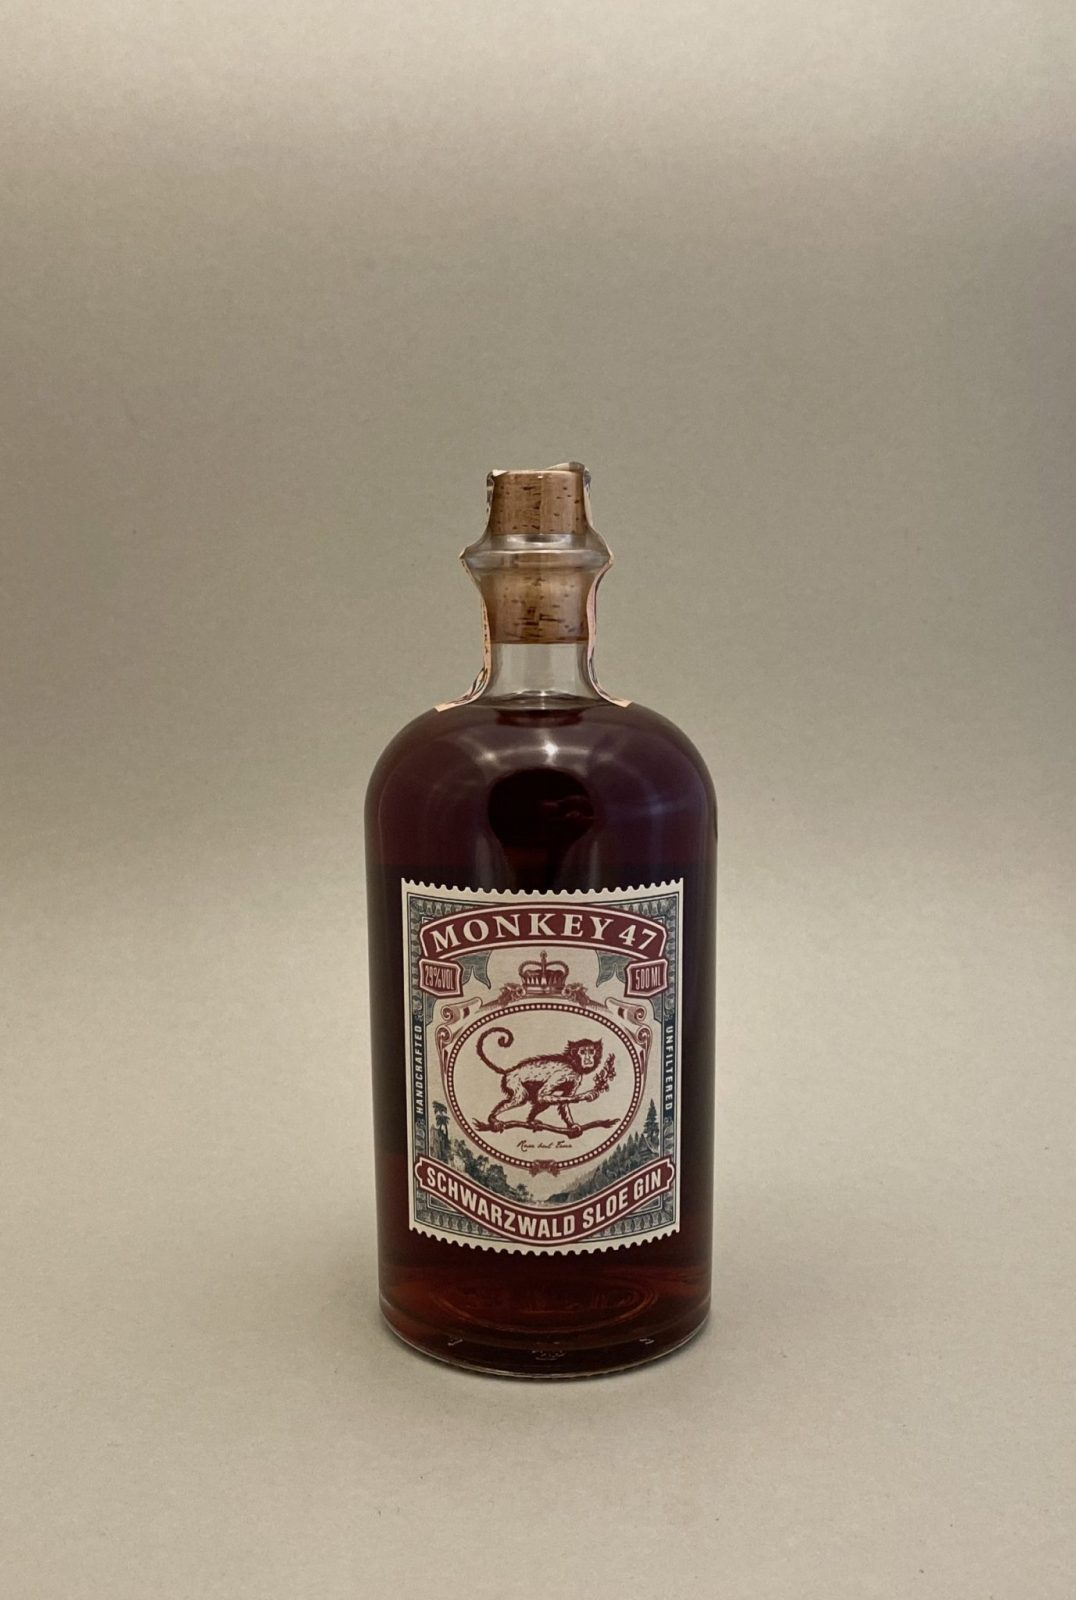 Monkey 47 Sloe Gin 29%, Bottleshop Sunny wines slnecnice mesto, petrzalka, Gin, rozvoz alkoholu, eshop